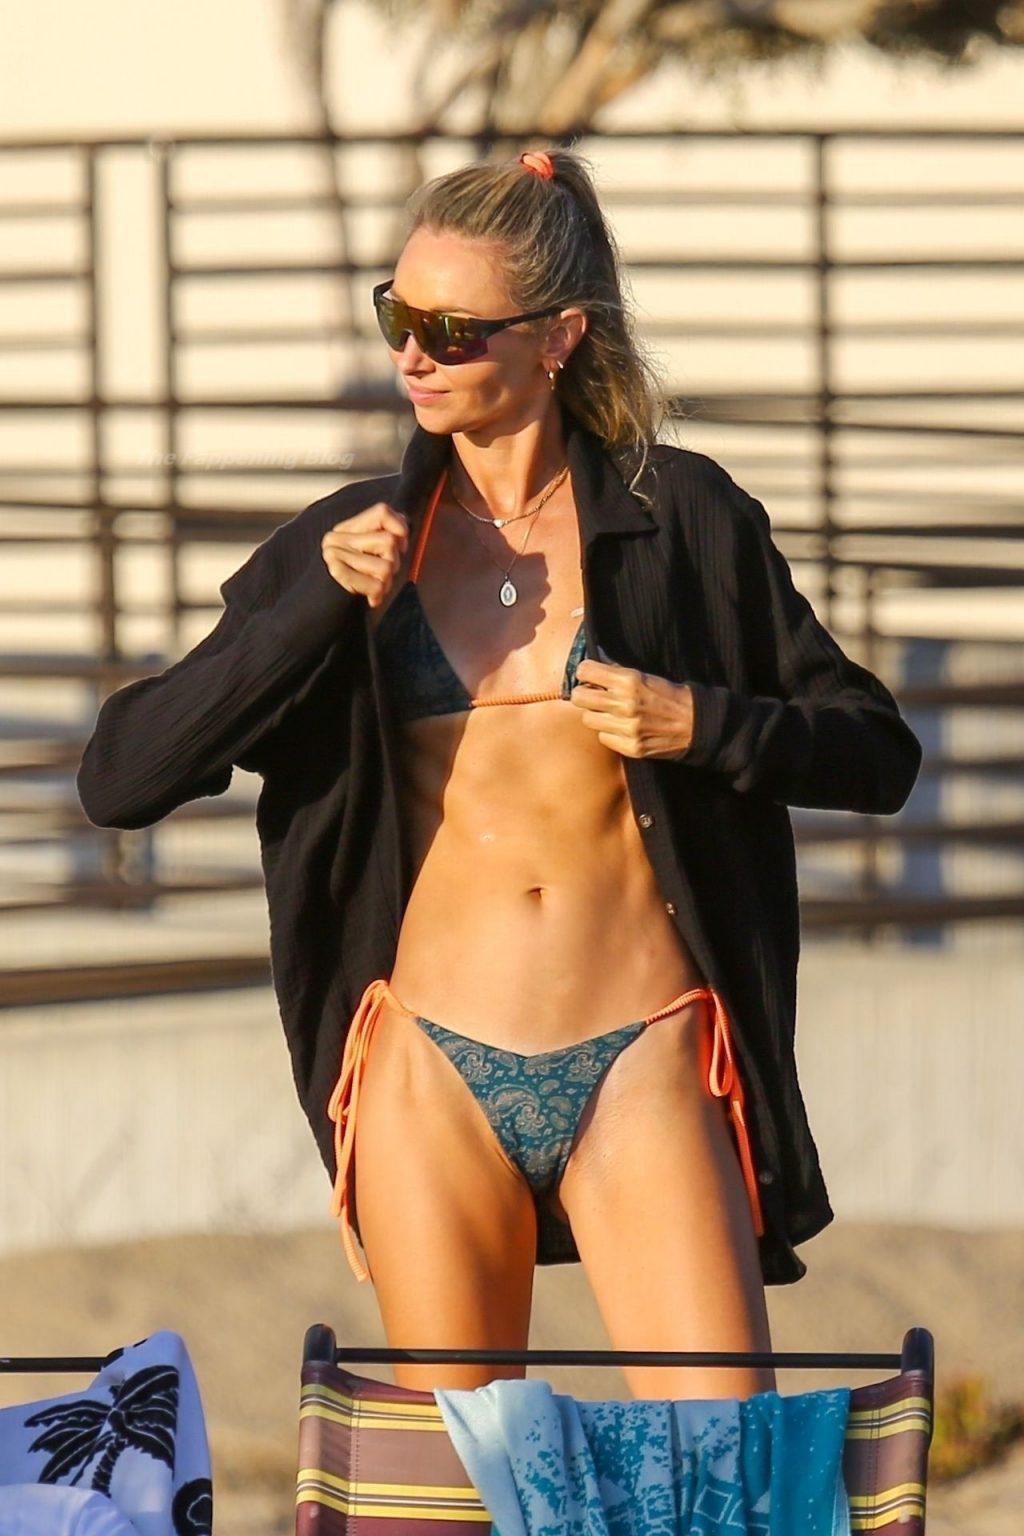 Ludi Delfino Attends a Beach Birthday Party in Santa Monica (9 Photos)